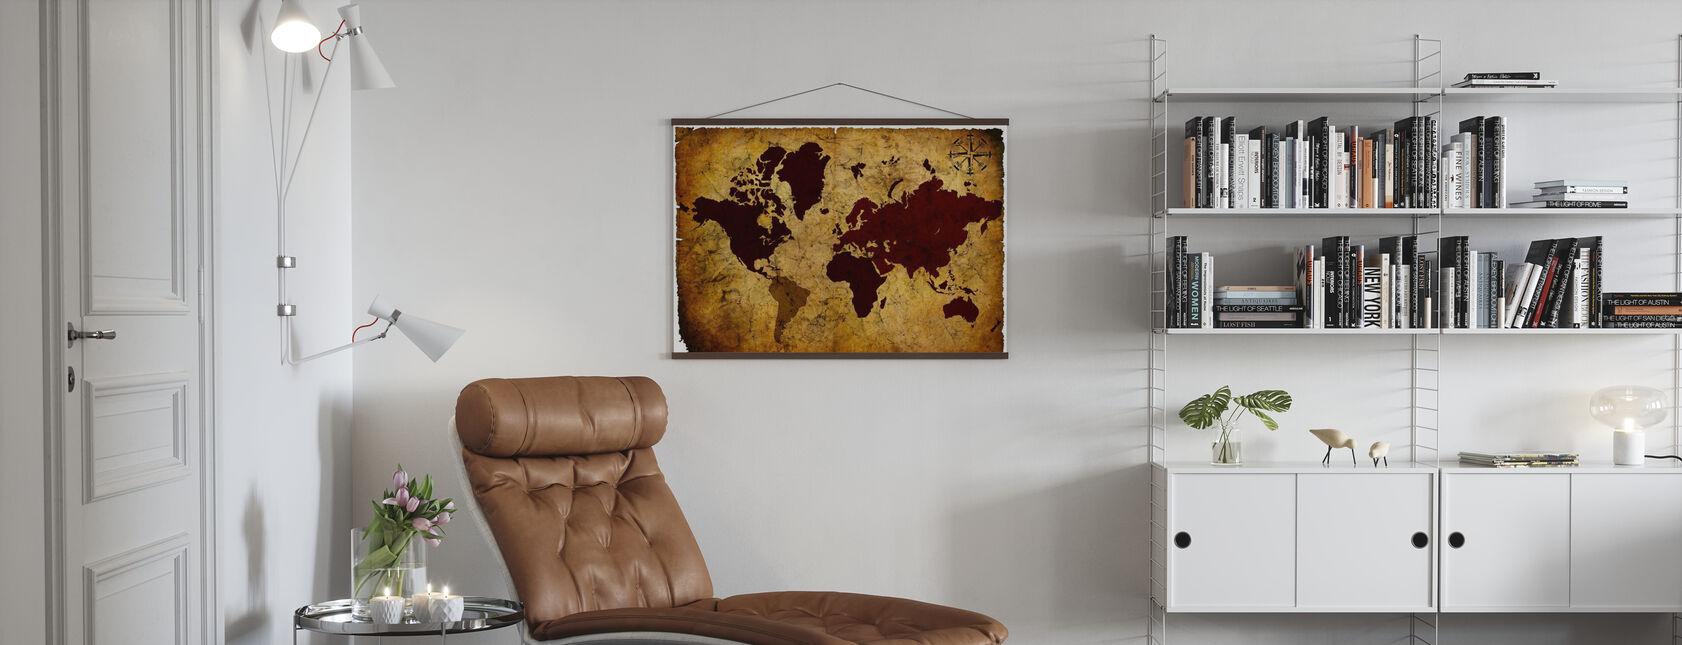 Old Manuscript of World Map - Poster - Living Room